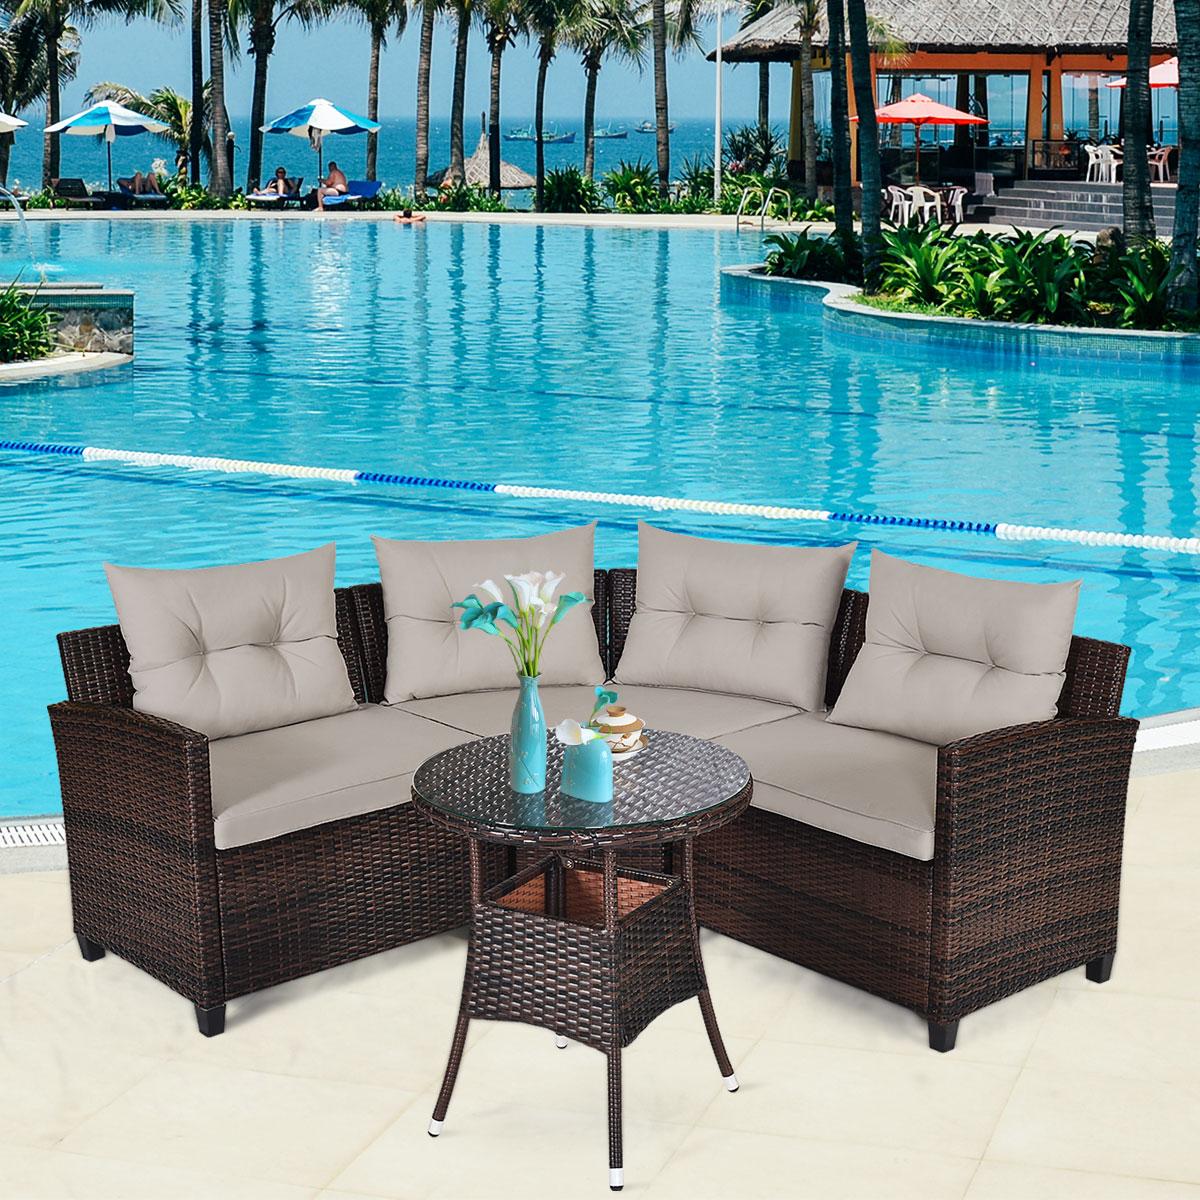 Patiojoy 4PCS Furniture Set Outdoor Patio Rattan Cushioned Sofa Table HW66920